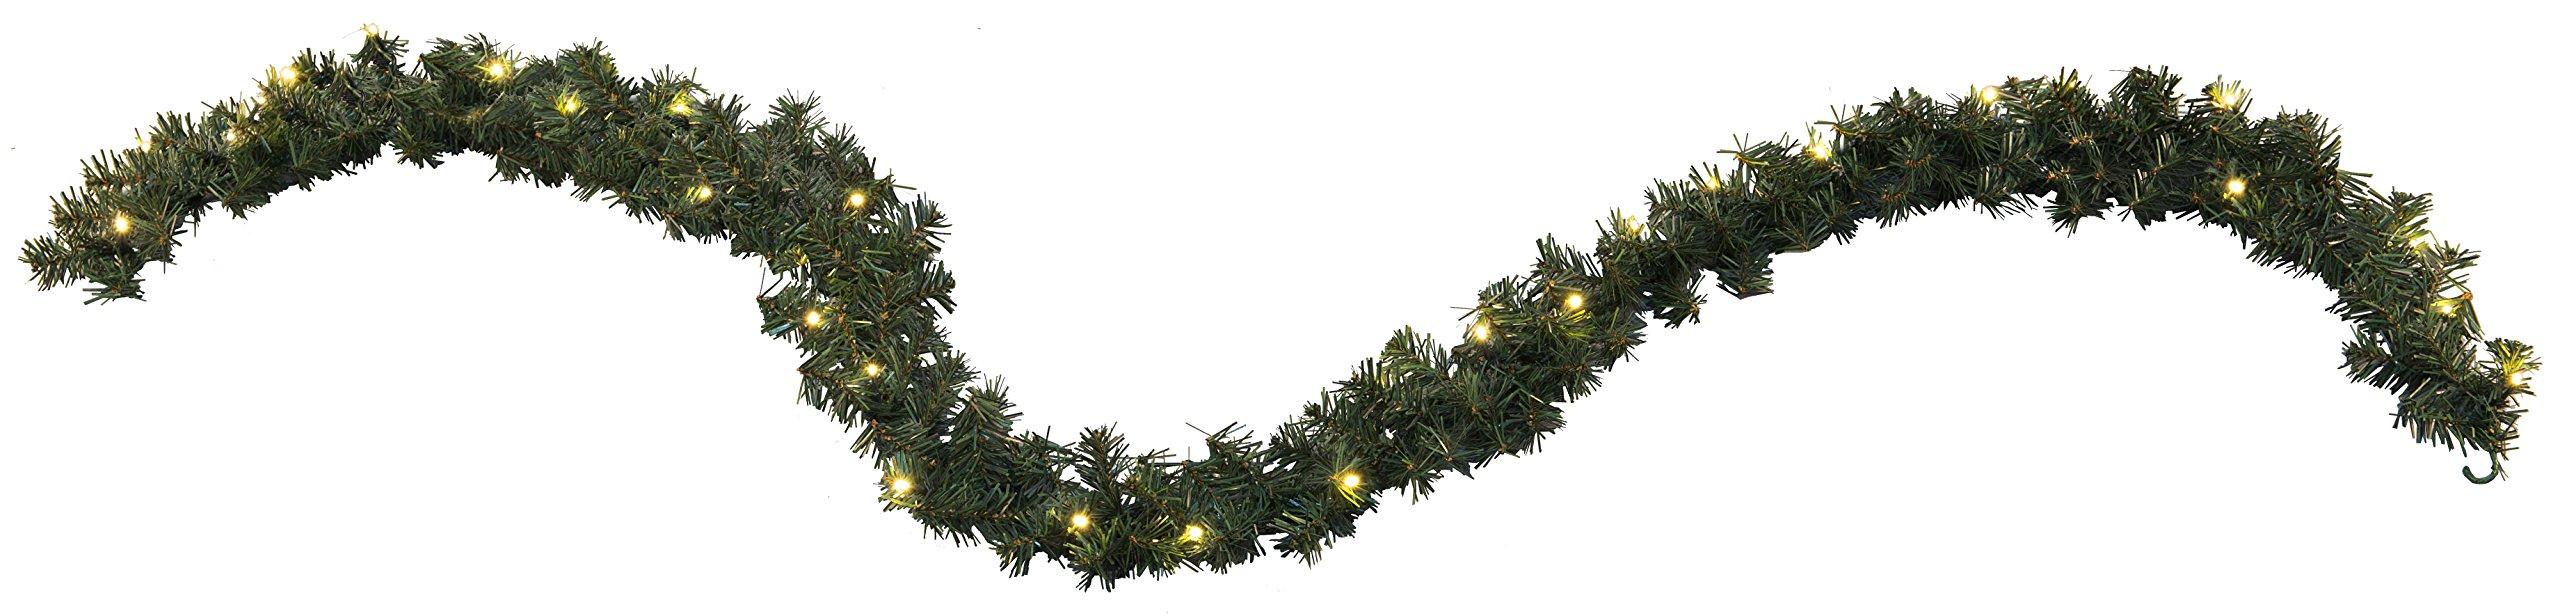 Star-LEDAlaska-Garland-beleuchtet-30-warmwei-LED-outdoor-Trafo-Vierfarb-Karton-270-cm-612-45